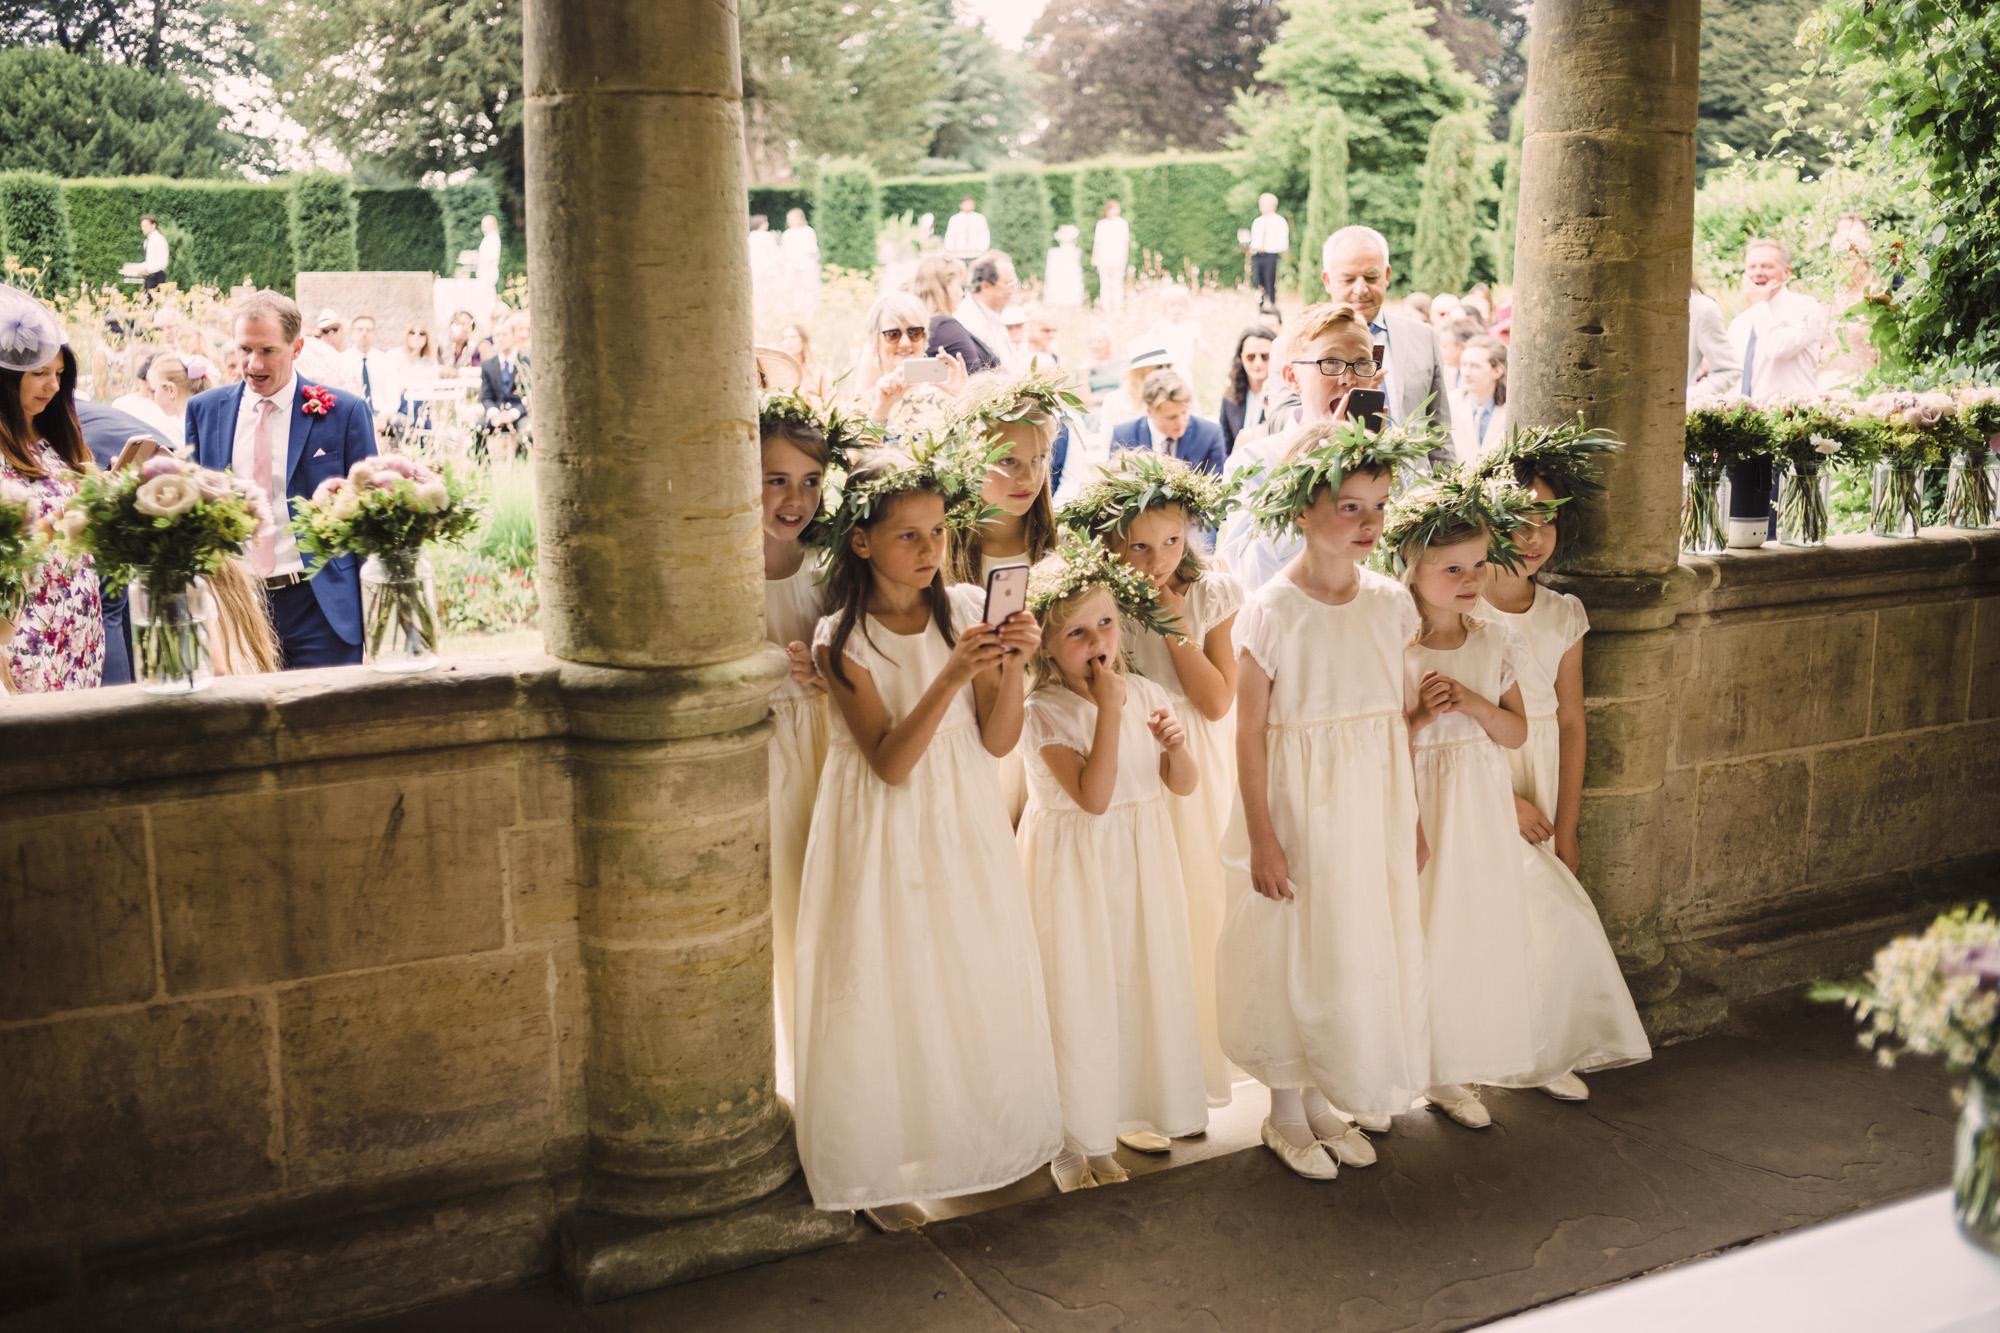 Jaz-Kate-Beaumont-Oyster-Silk-Bias-Cut-Wedding-Gown-Larkspur-Lace-Top-Sussex-Wedding-8.jpg